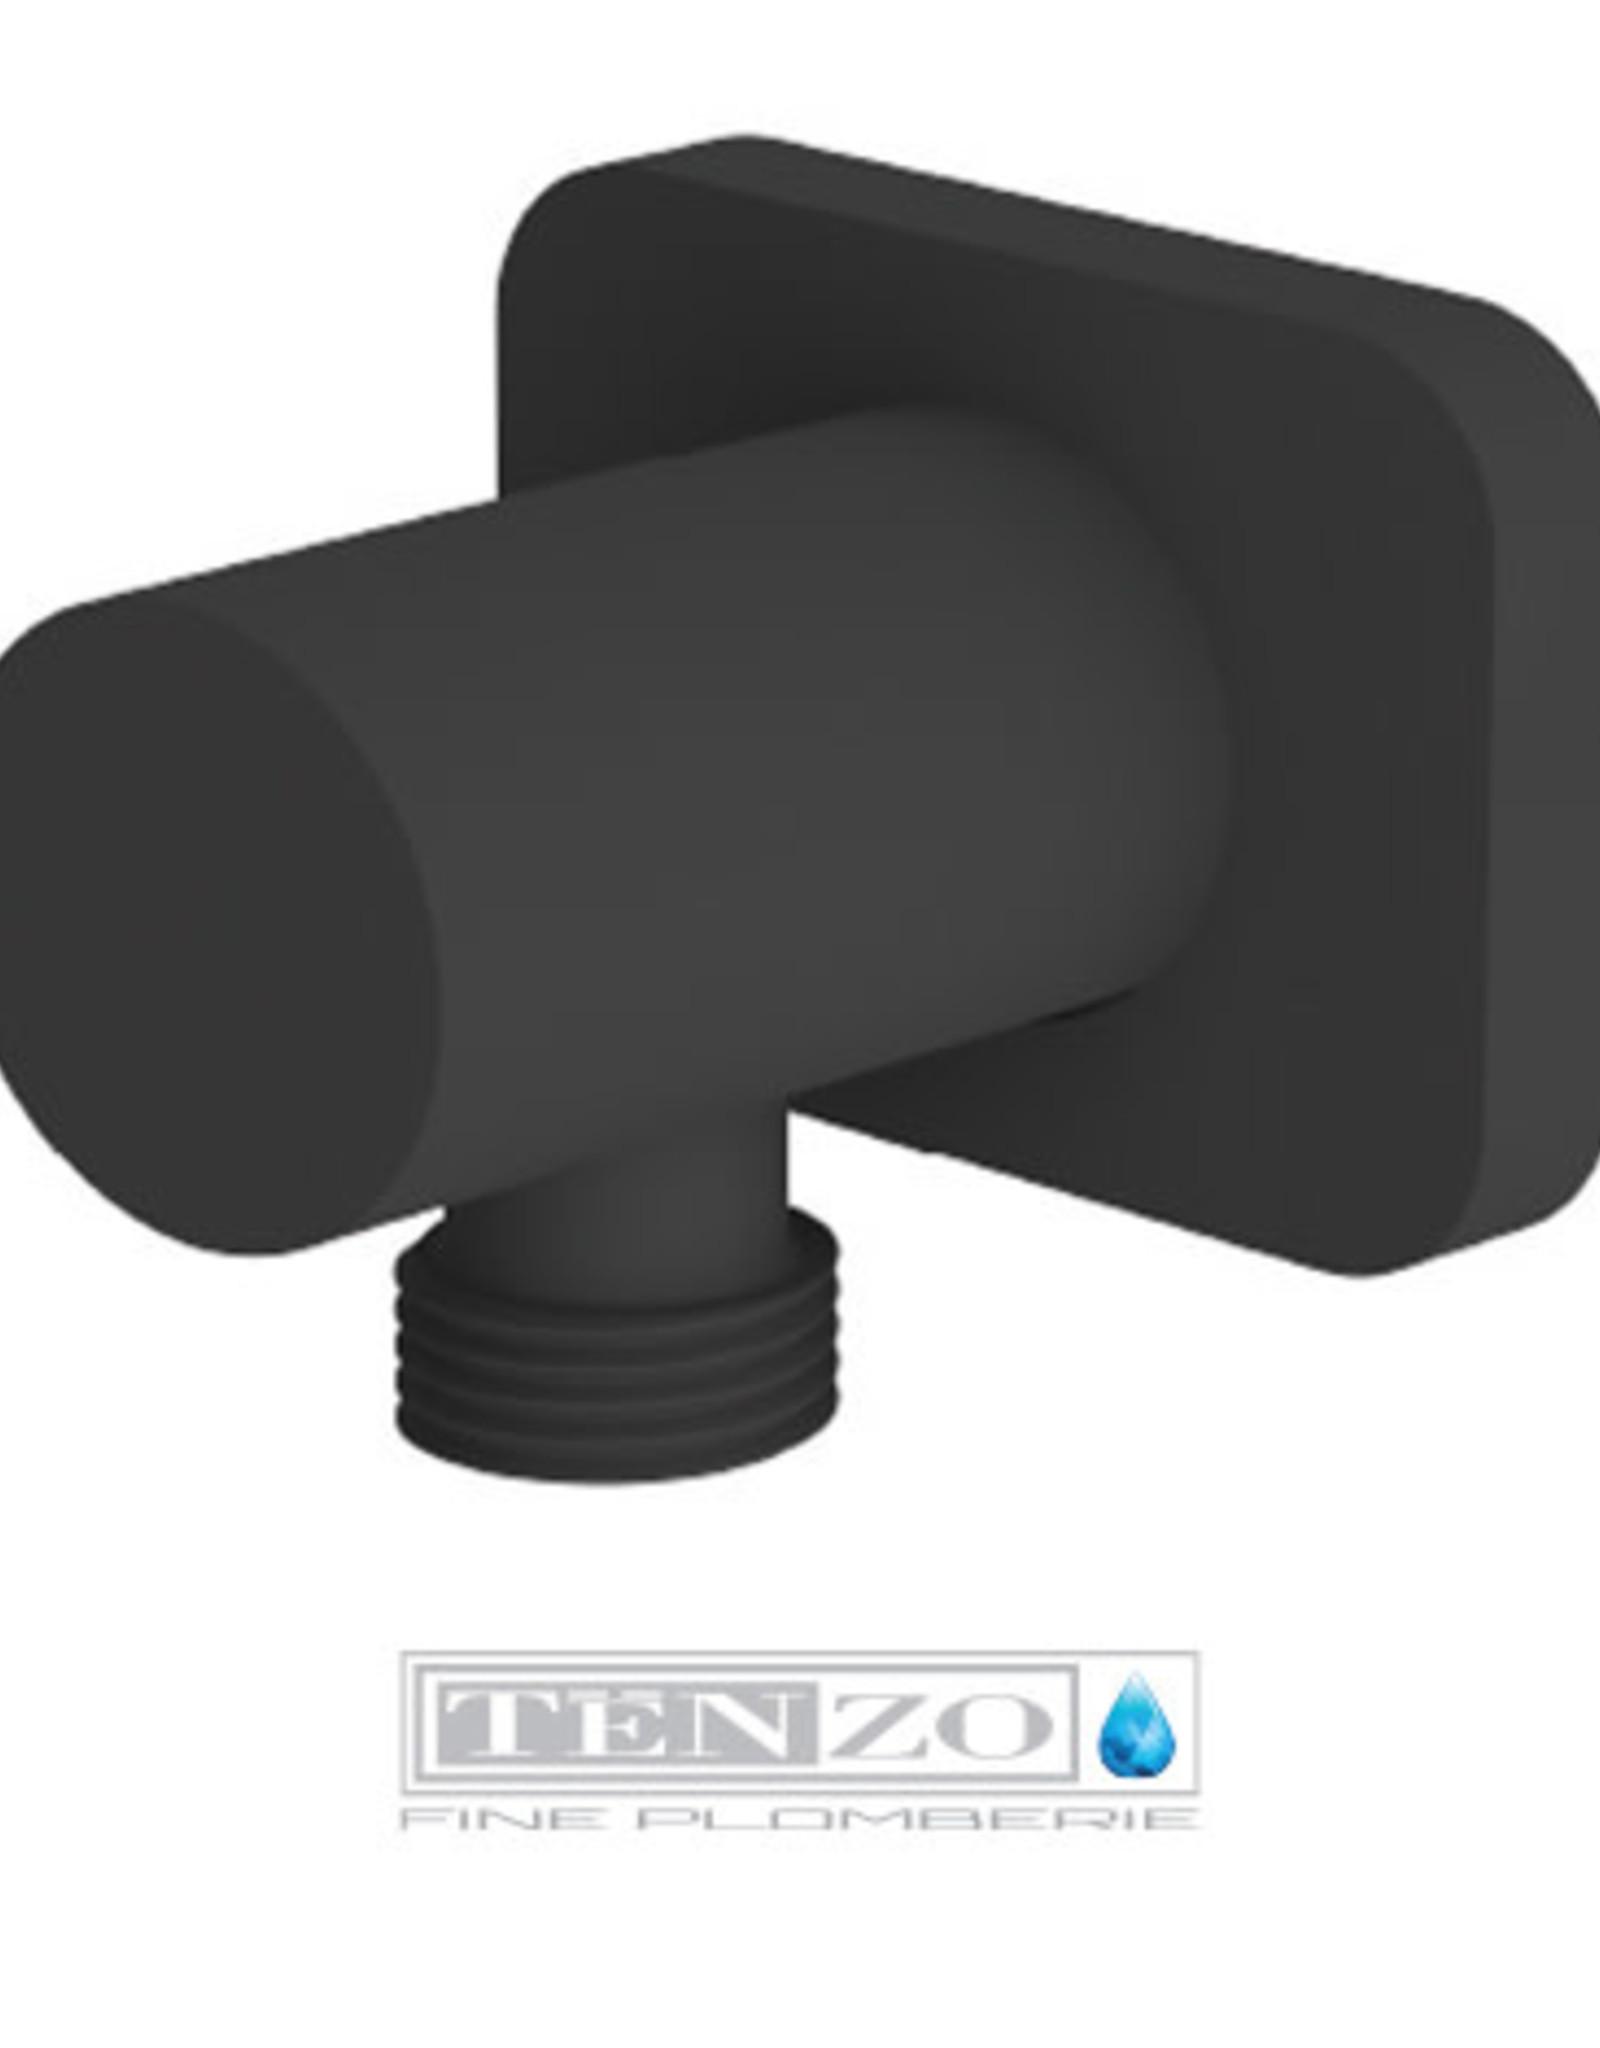 Tenzo Tenzo Square Drop Elbow